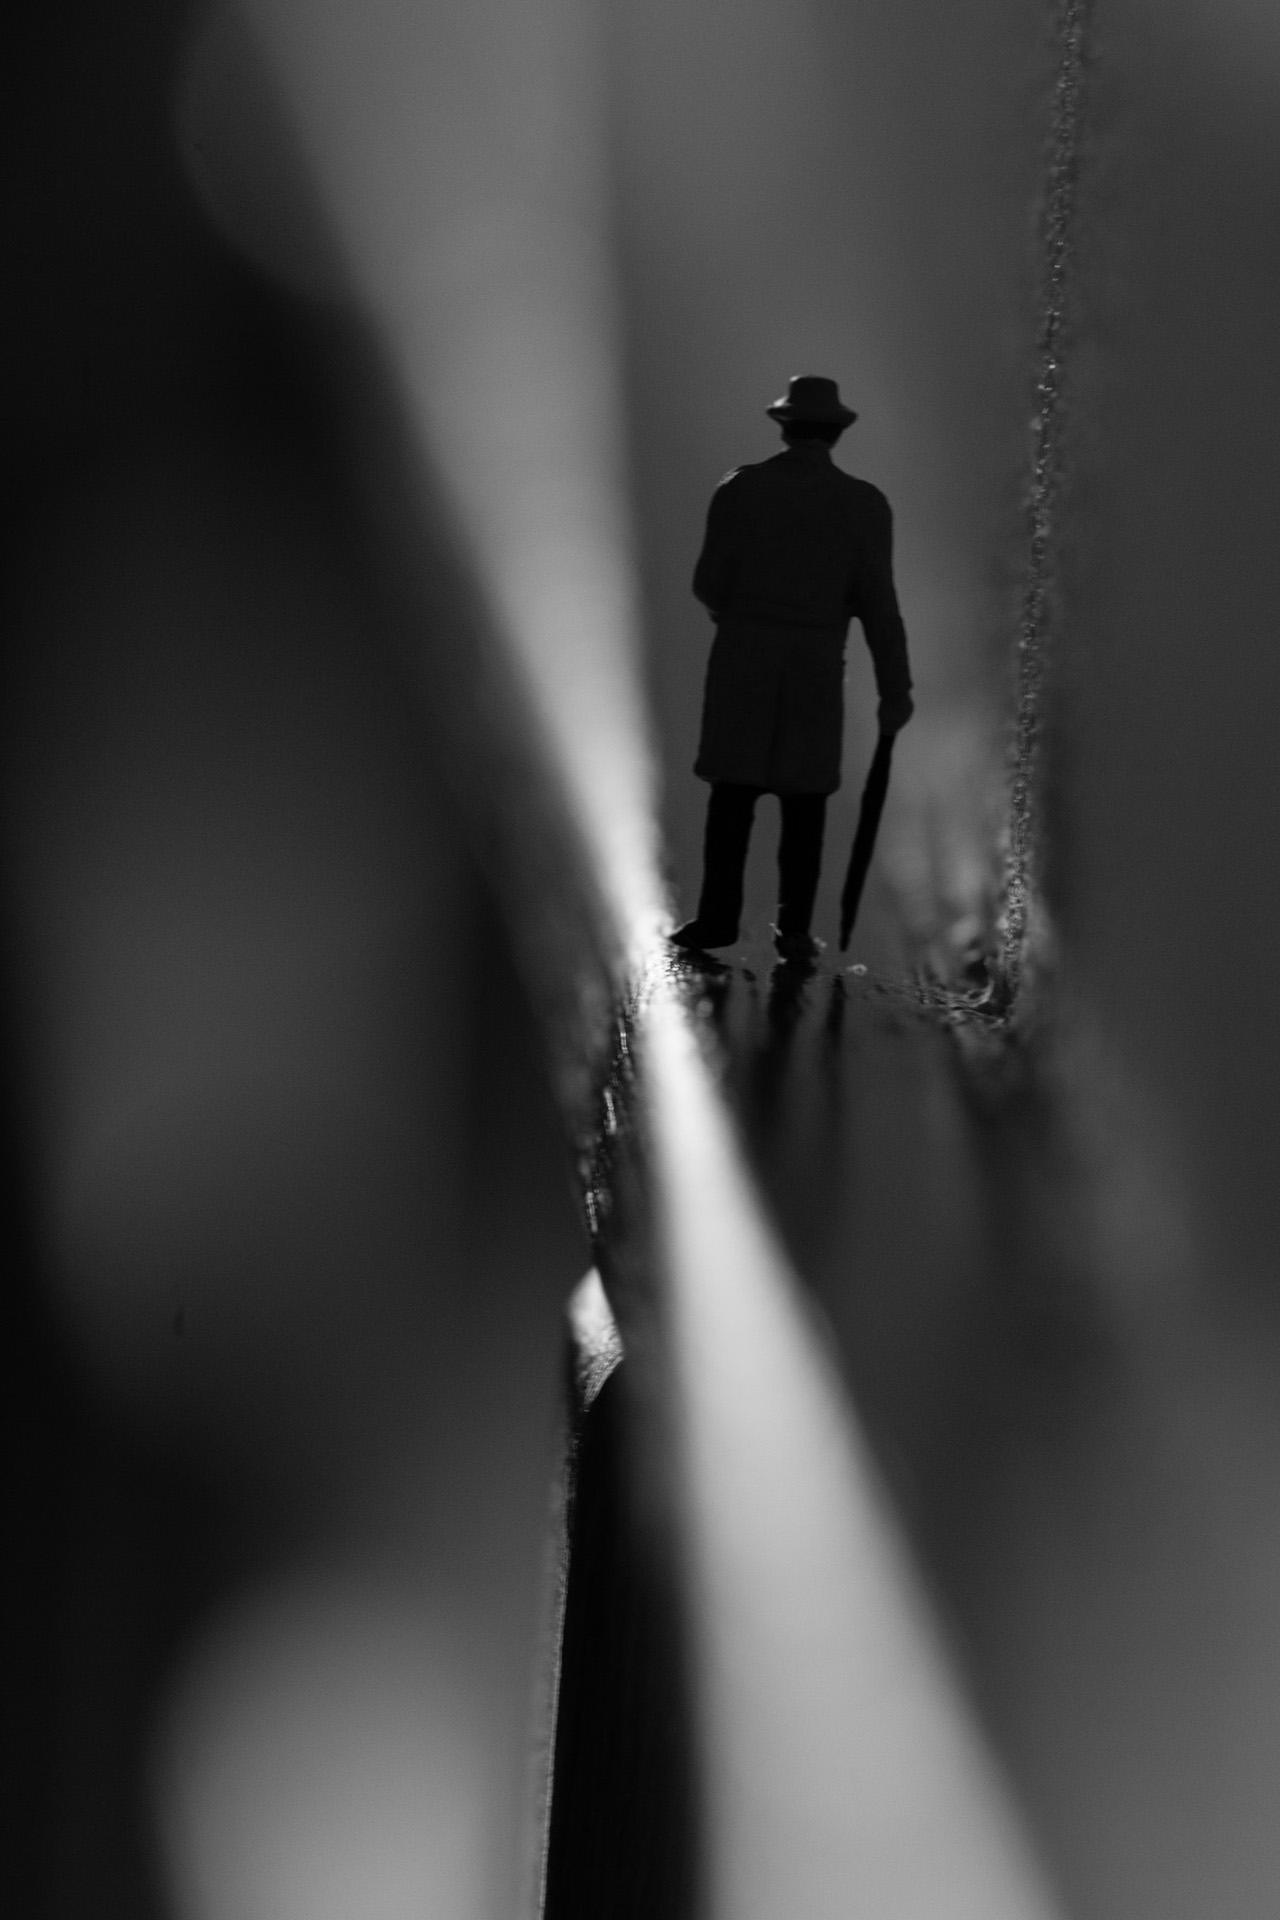 Fotograaf: Astrid Sanders 'Mysterieus'